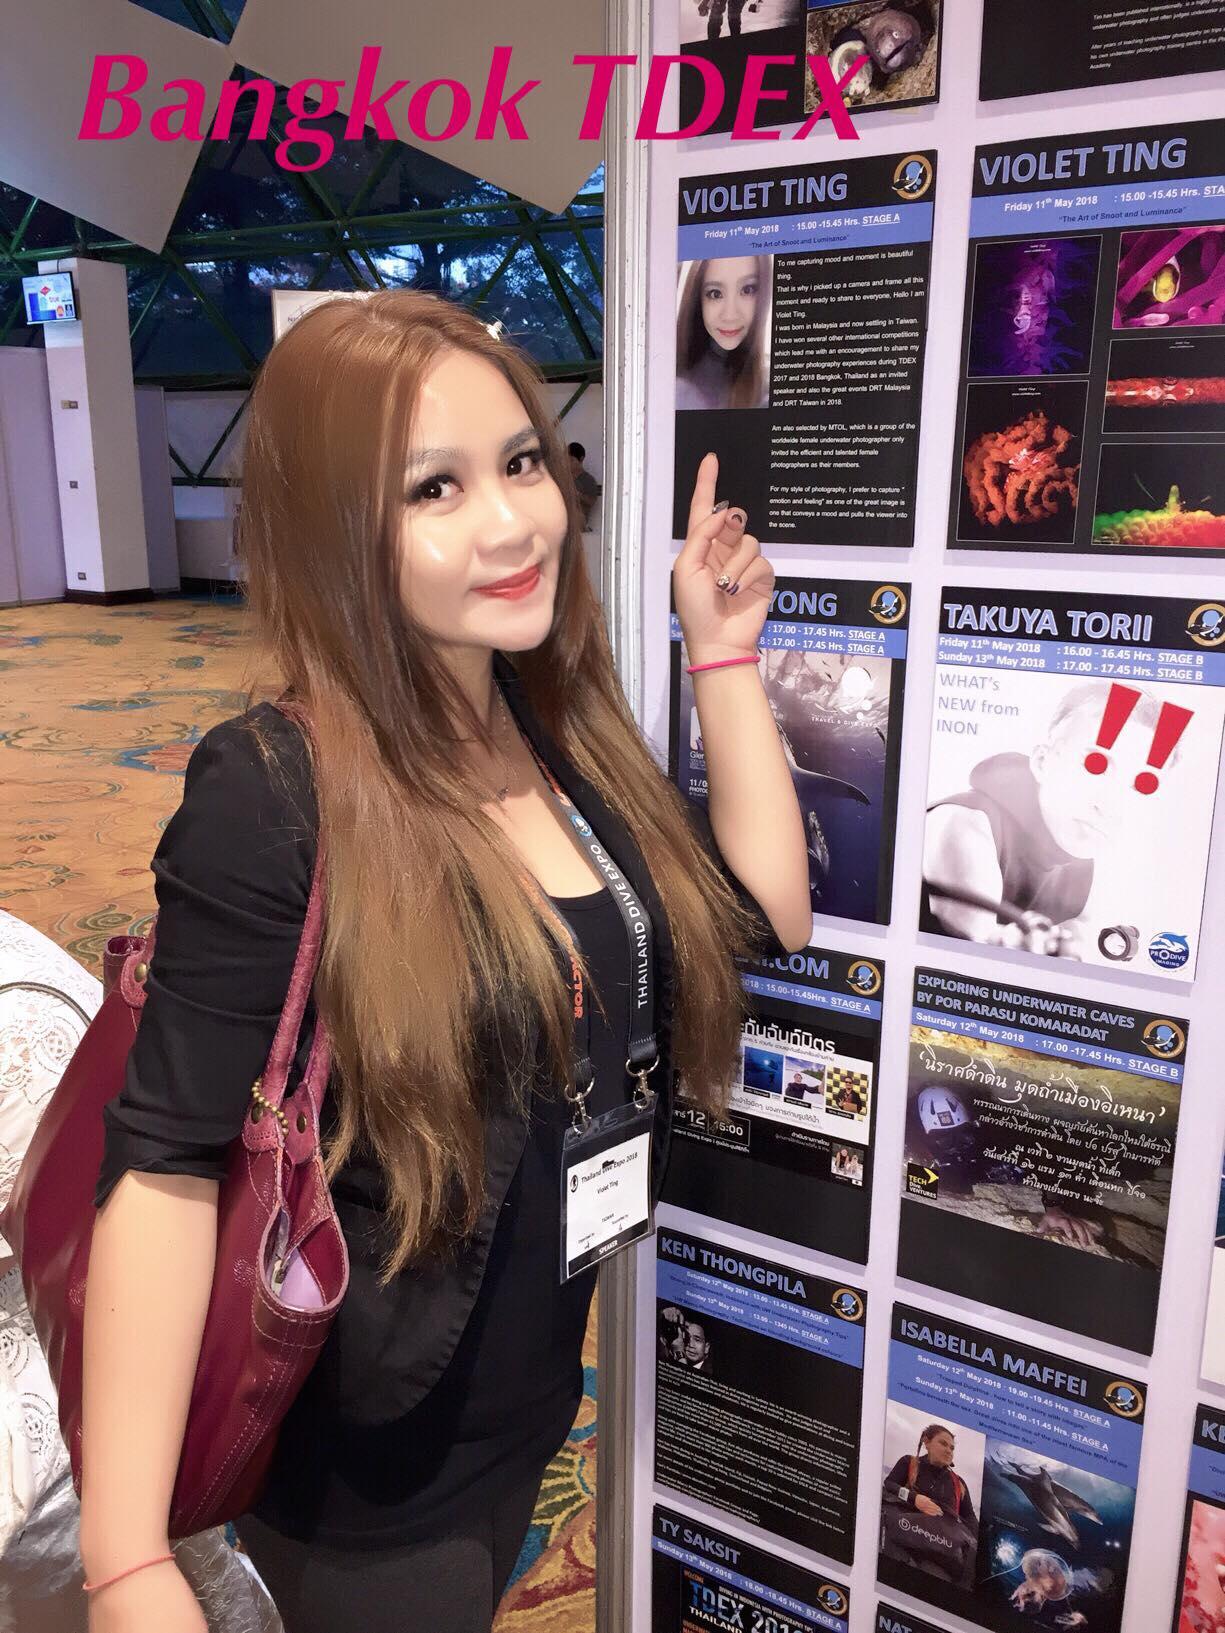 thailand Bangkok TDEX Presentation